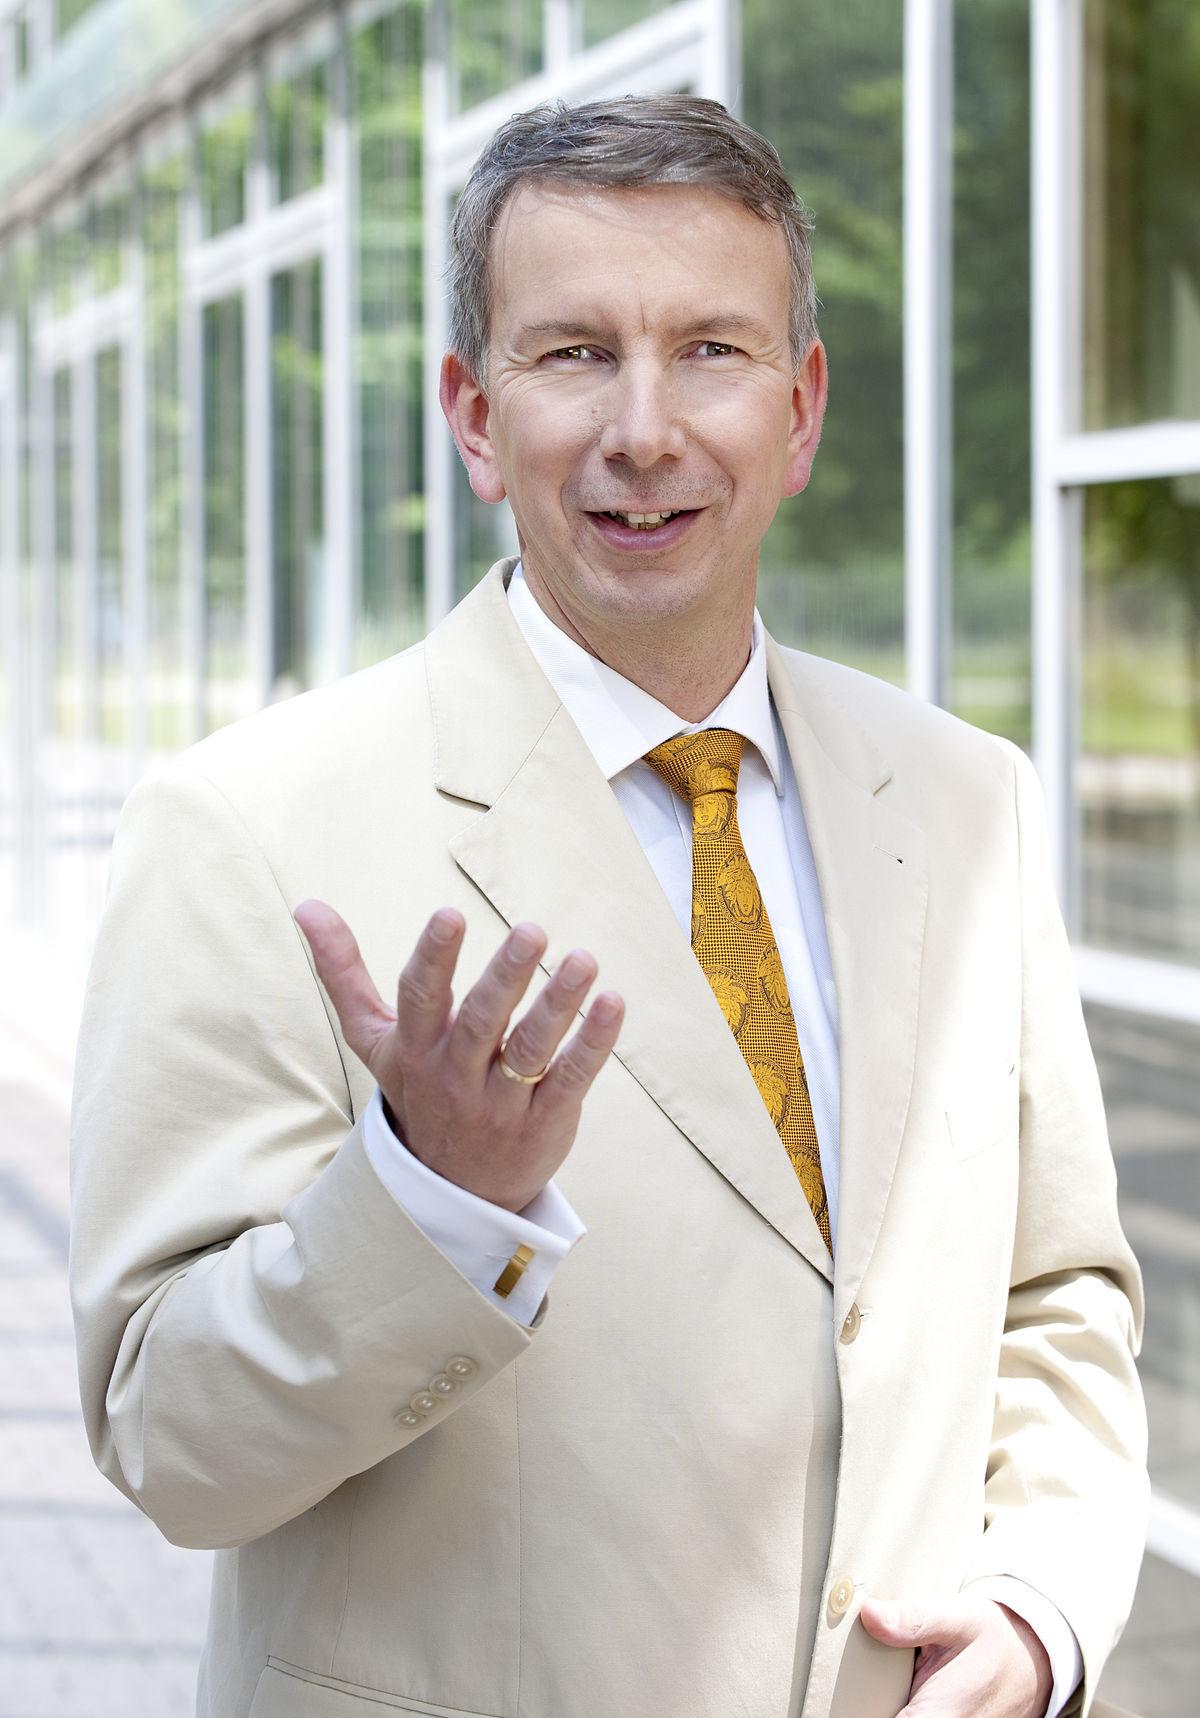 prof dr michael schäfer